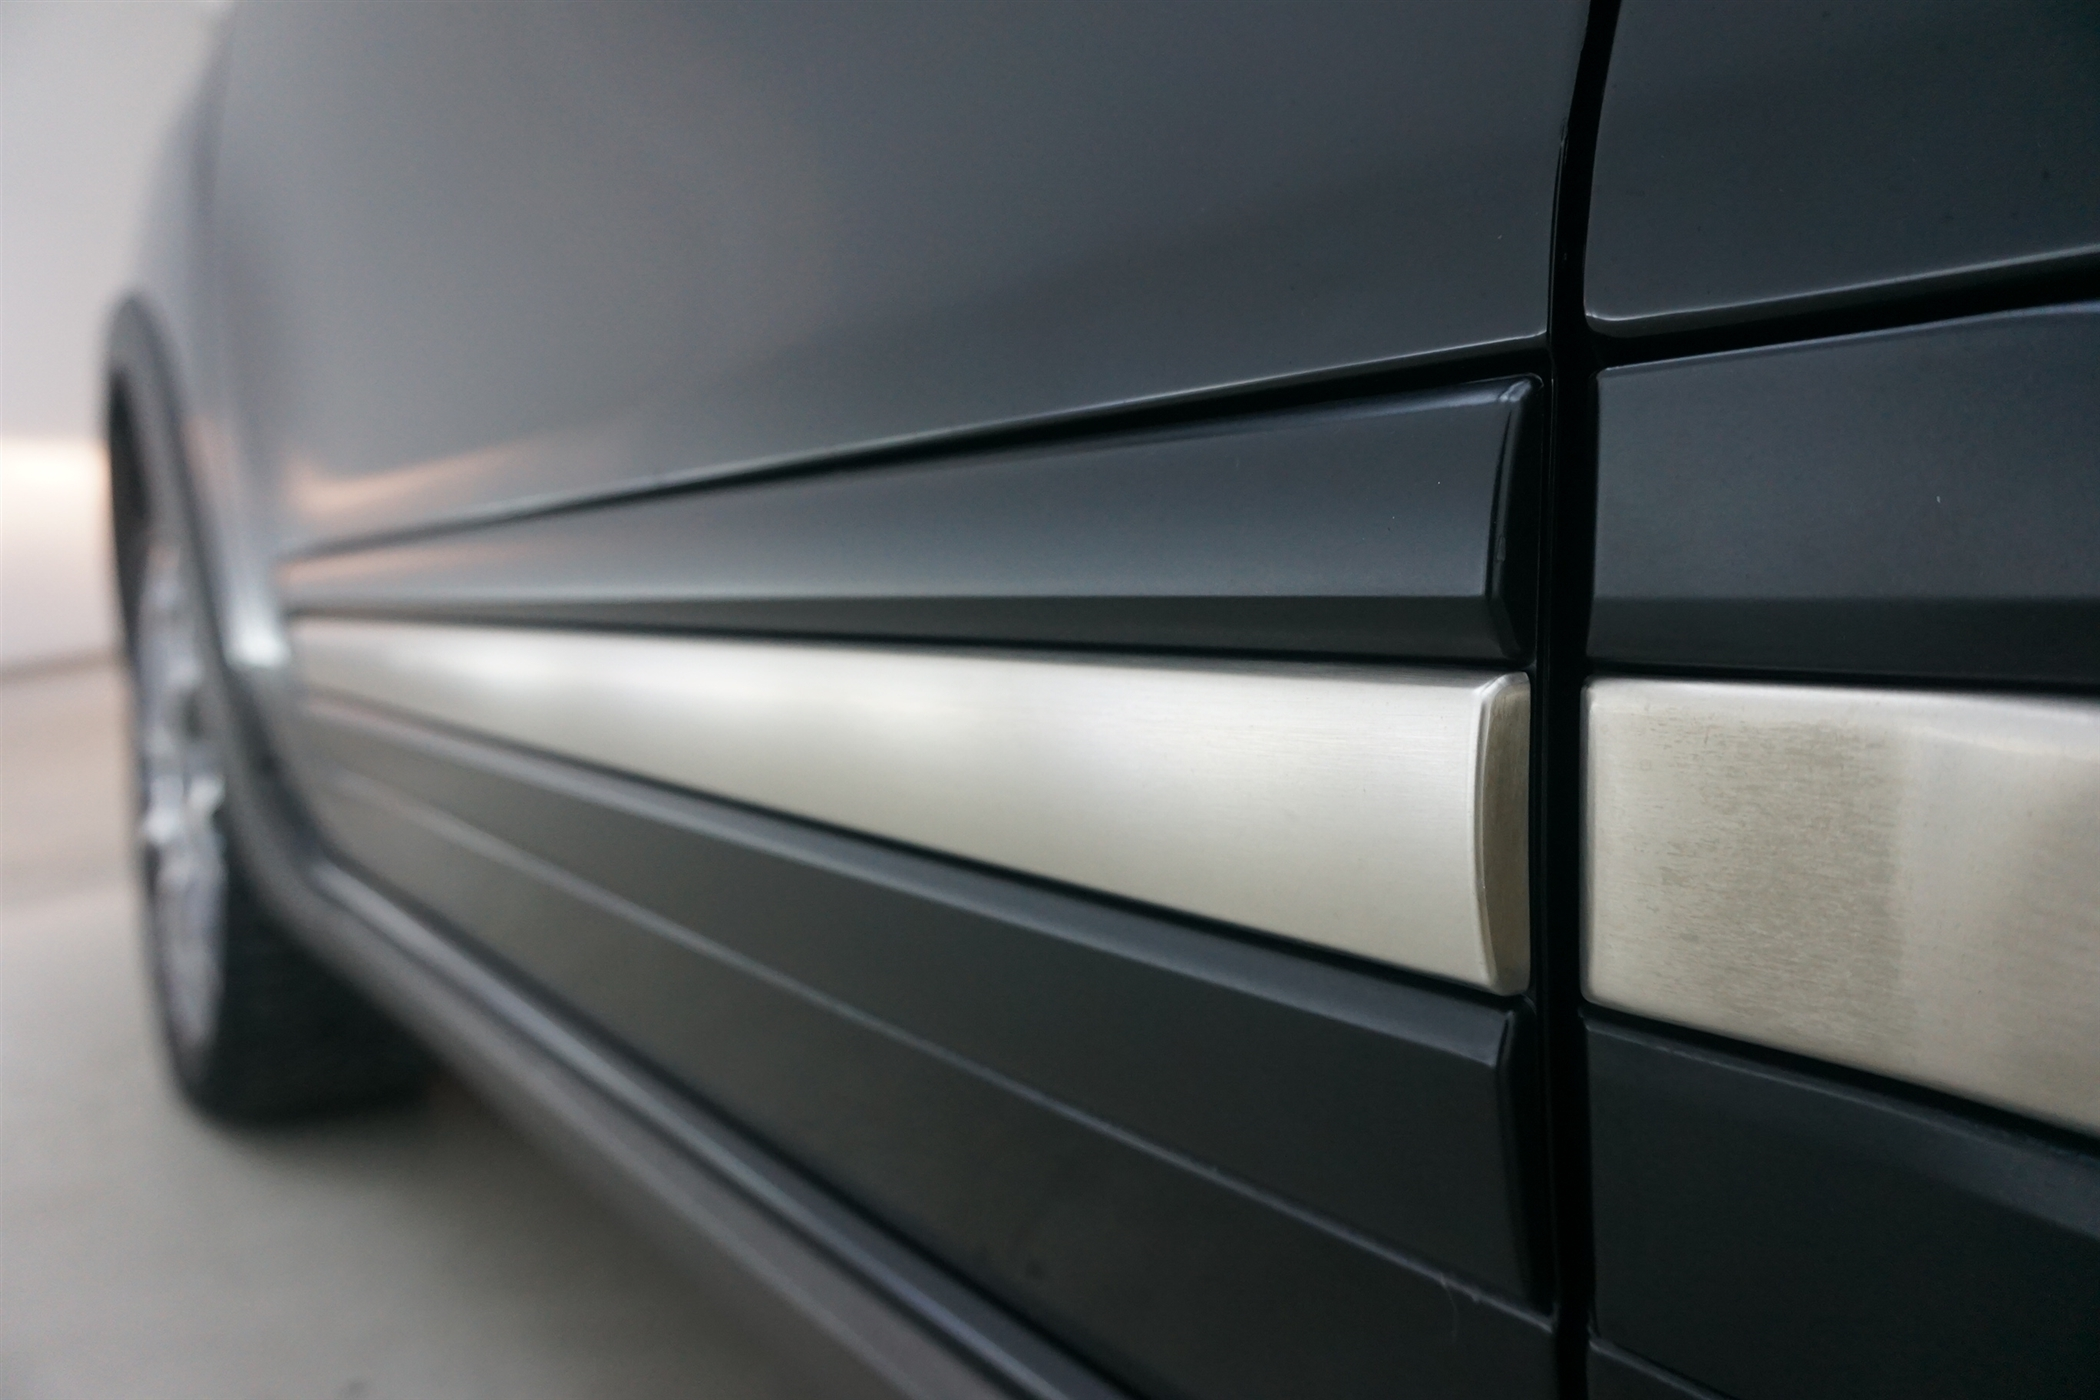 Fiat 500L 1.3 Multijet Trekking S&S